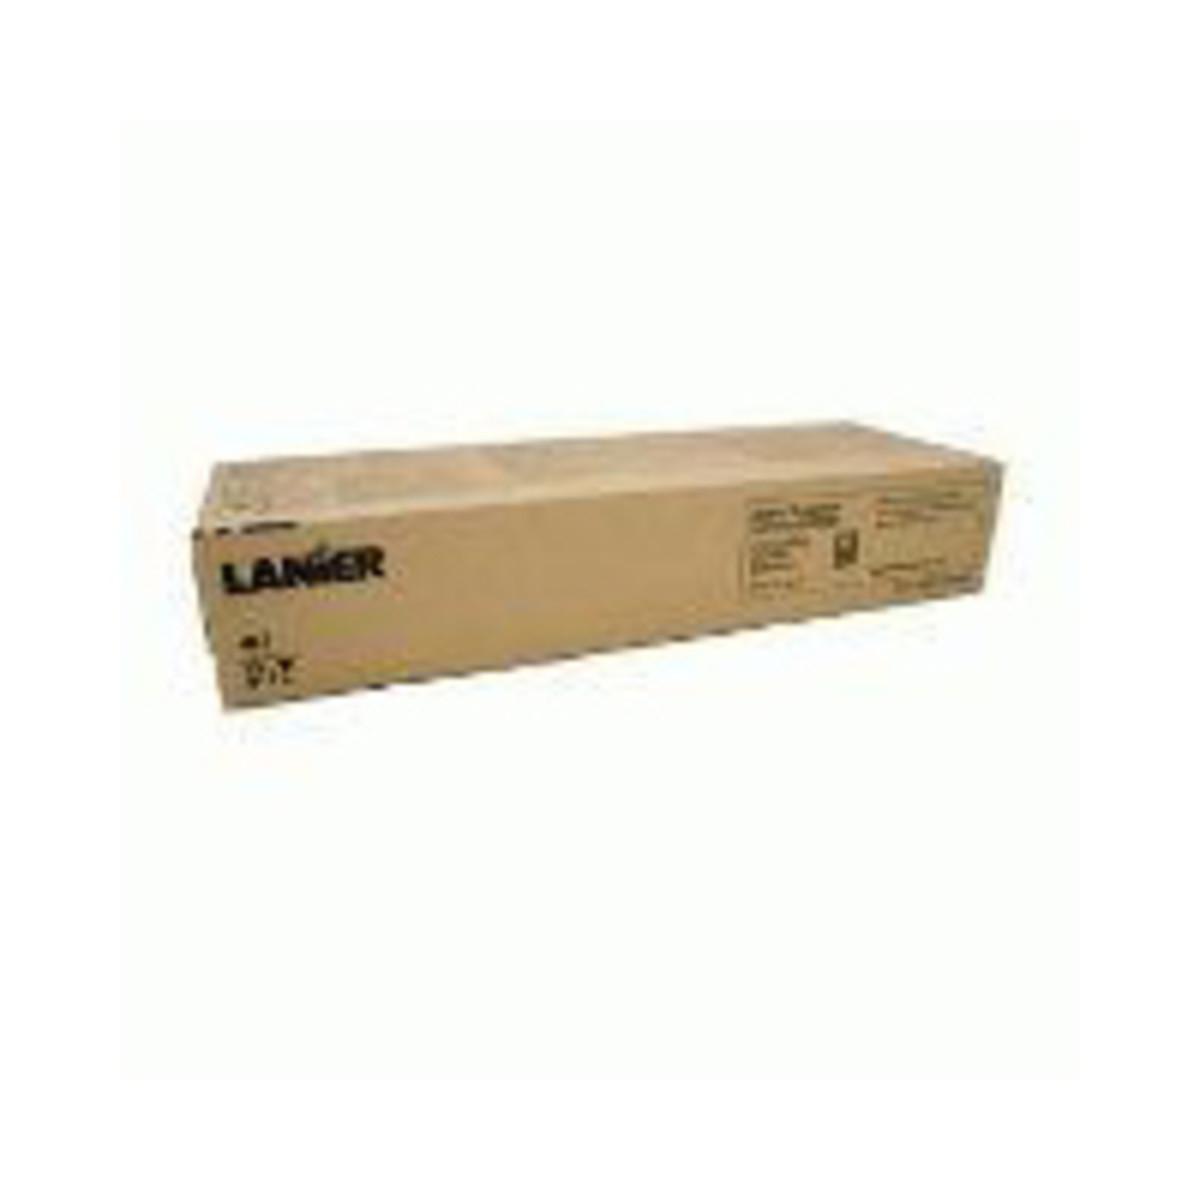 Lanier 888-336 Black Toner Cartridge